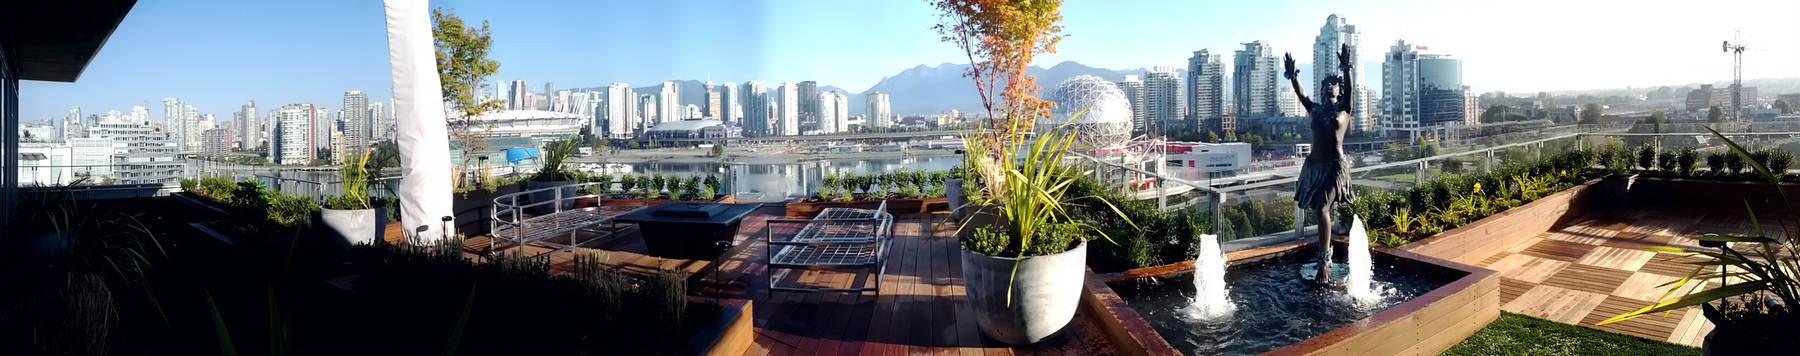 Olympic Village - Penthouse Image 3.JPG